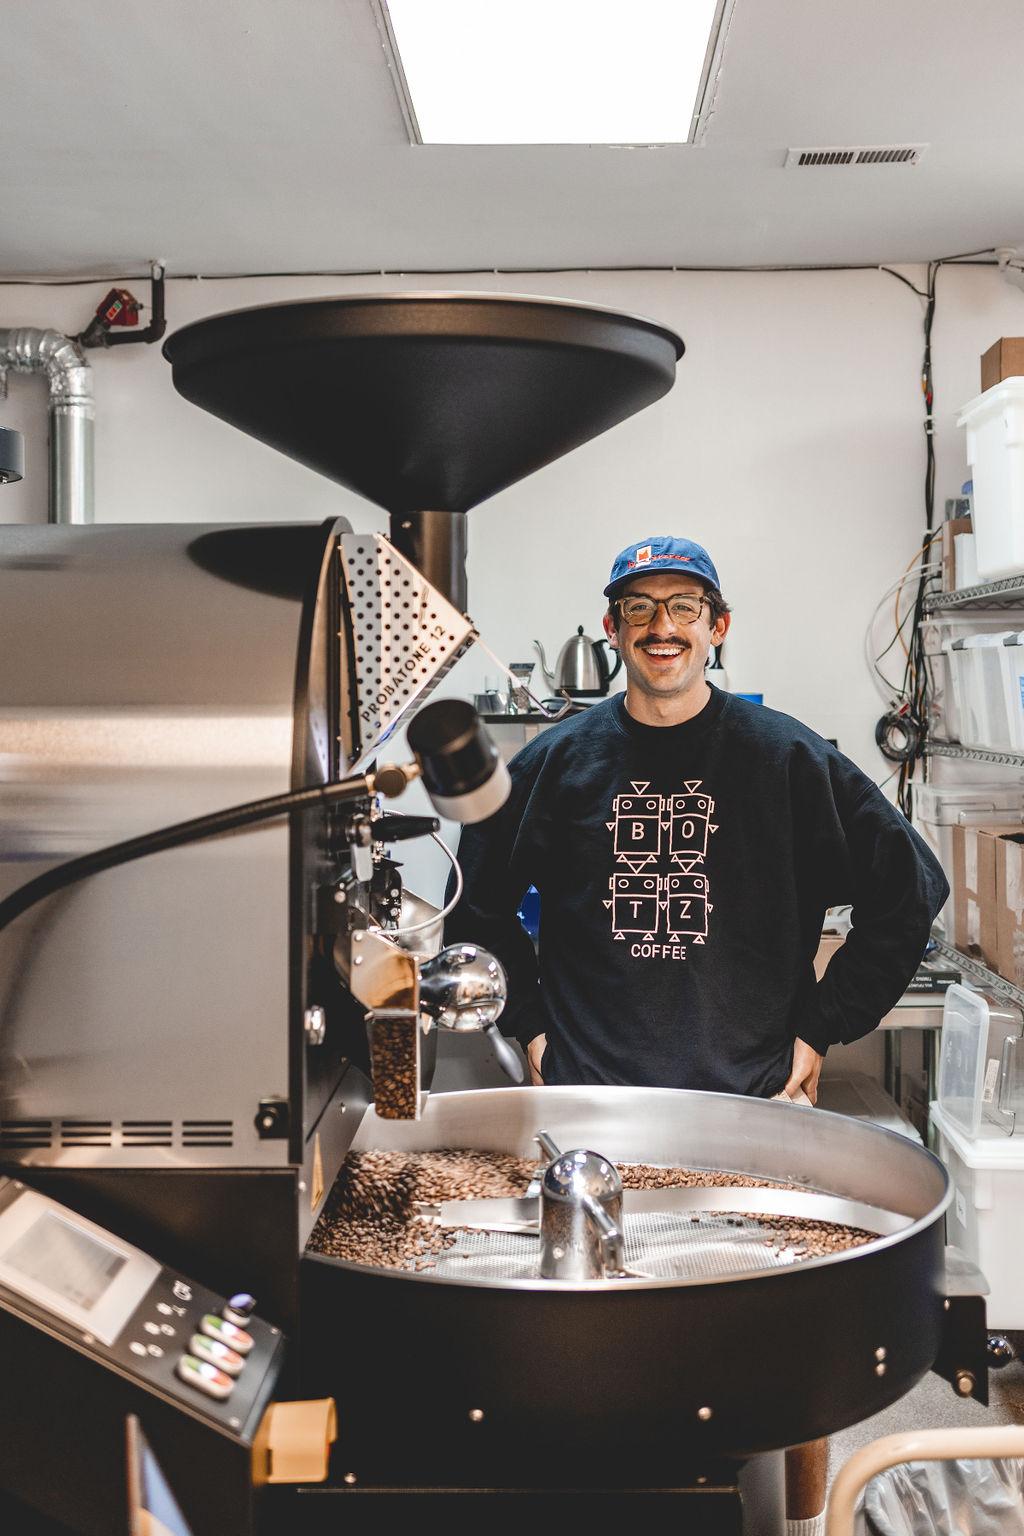 Danny Falloon Botz Coffee